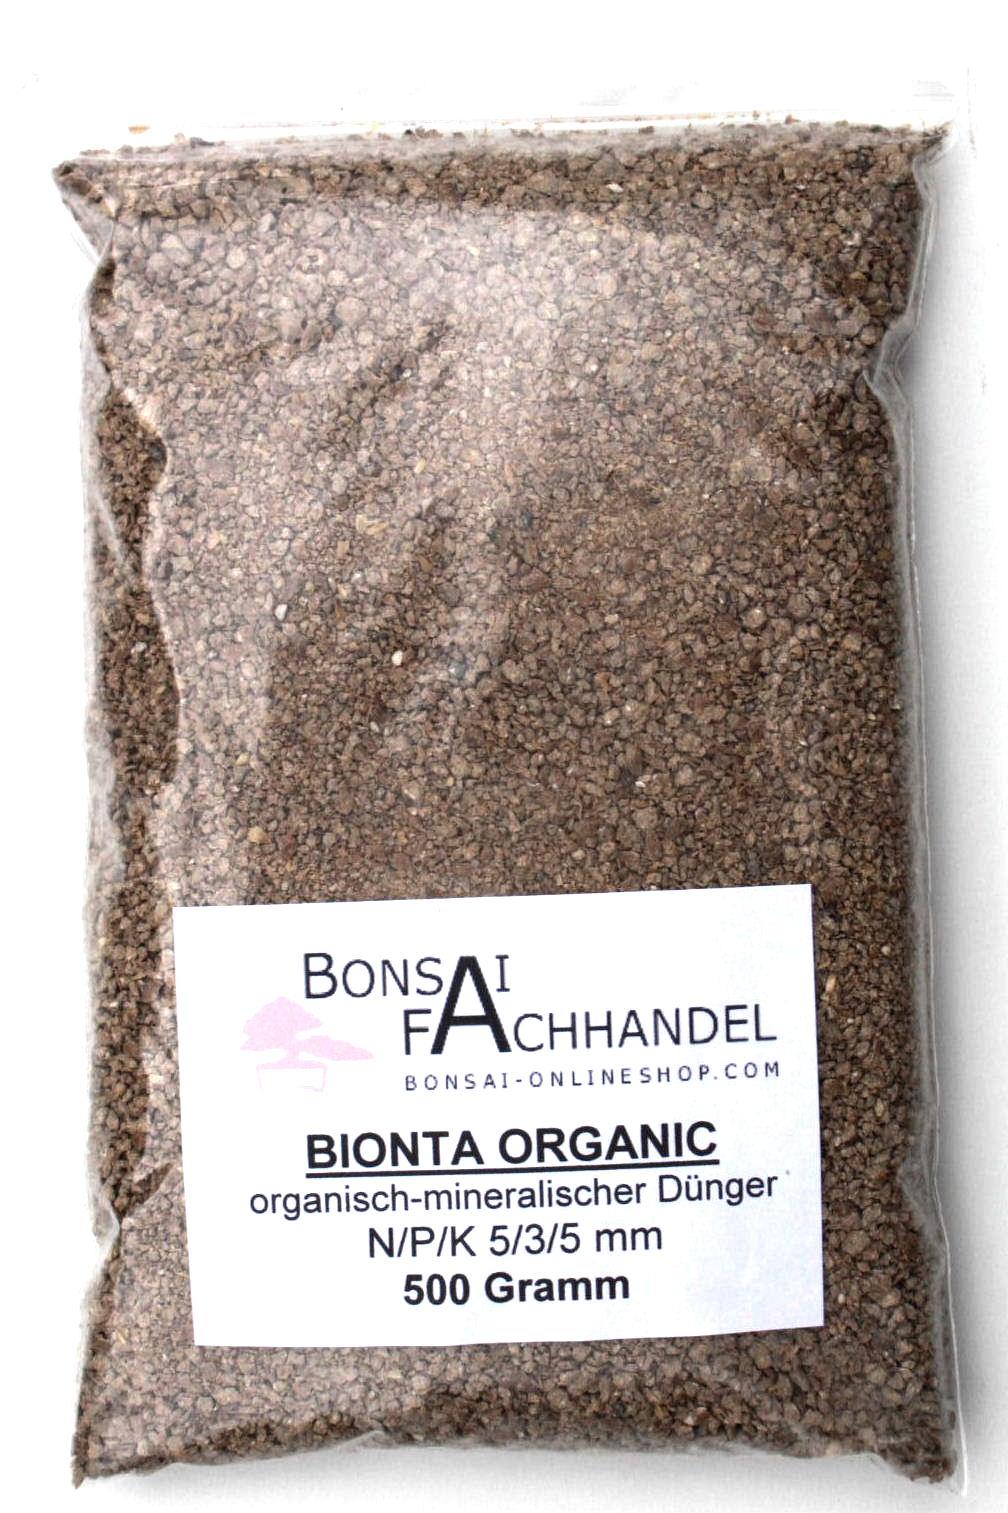 bionta organic universal d nger 500 gramm bei oyaki bonsai kaufen. Black Bedroom Furniture Sets. Home Design Ideas